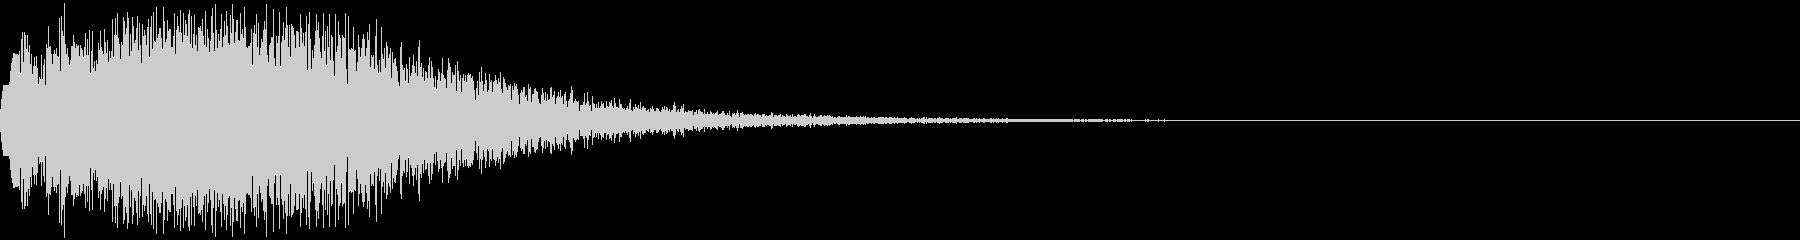 チャララララララーンの未再生の波形